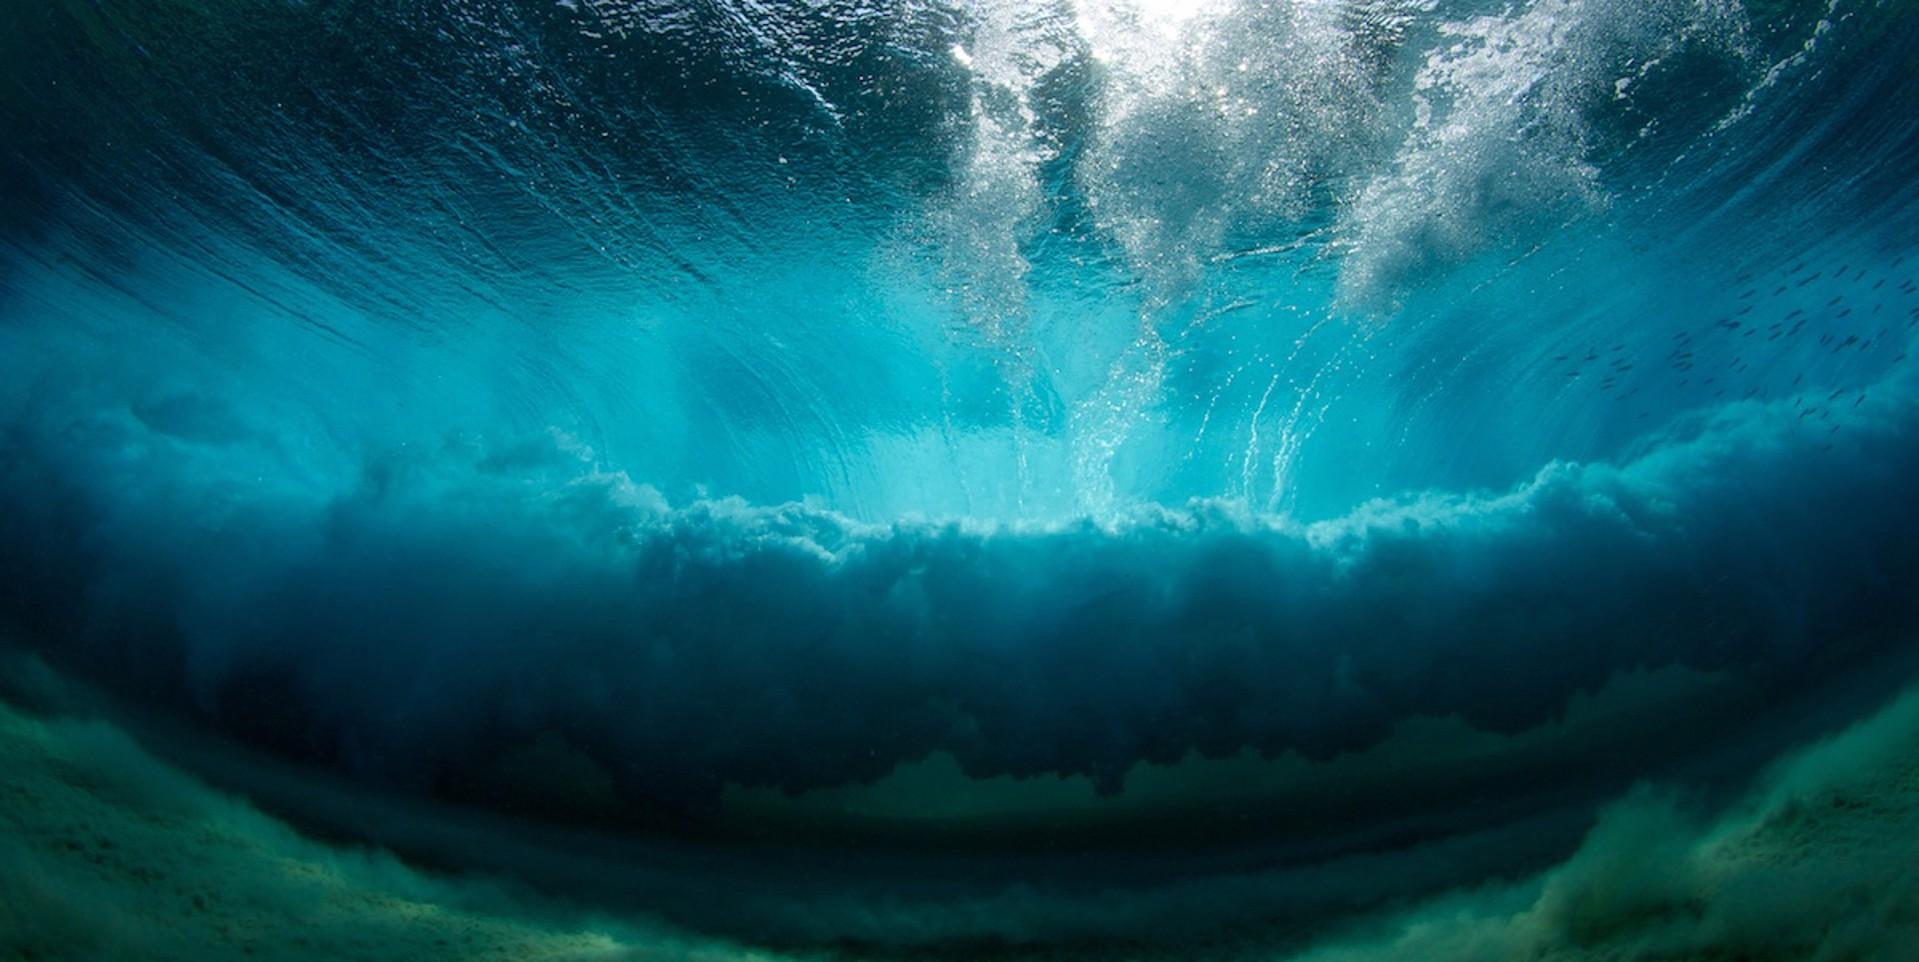 Behind the Barrel by Bryce Groark